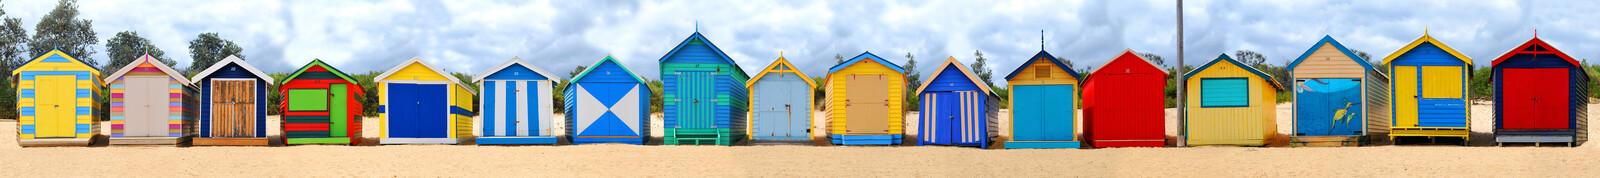 Brighton Beach Huts I - Michael Warrilow